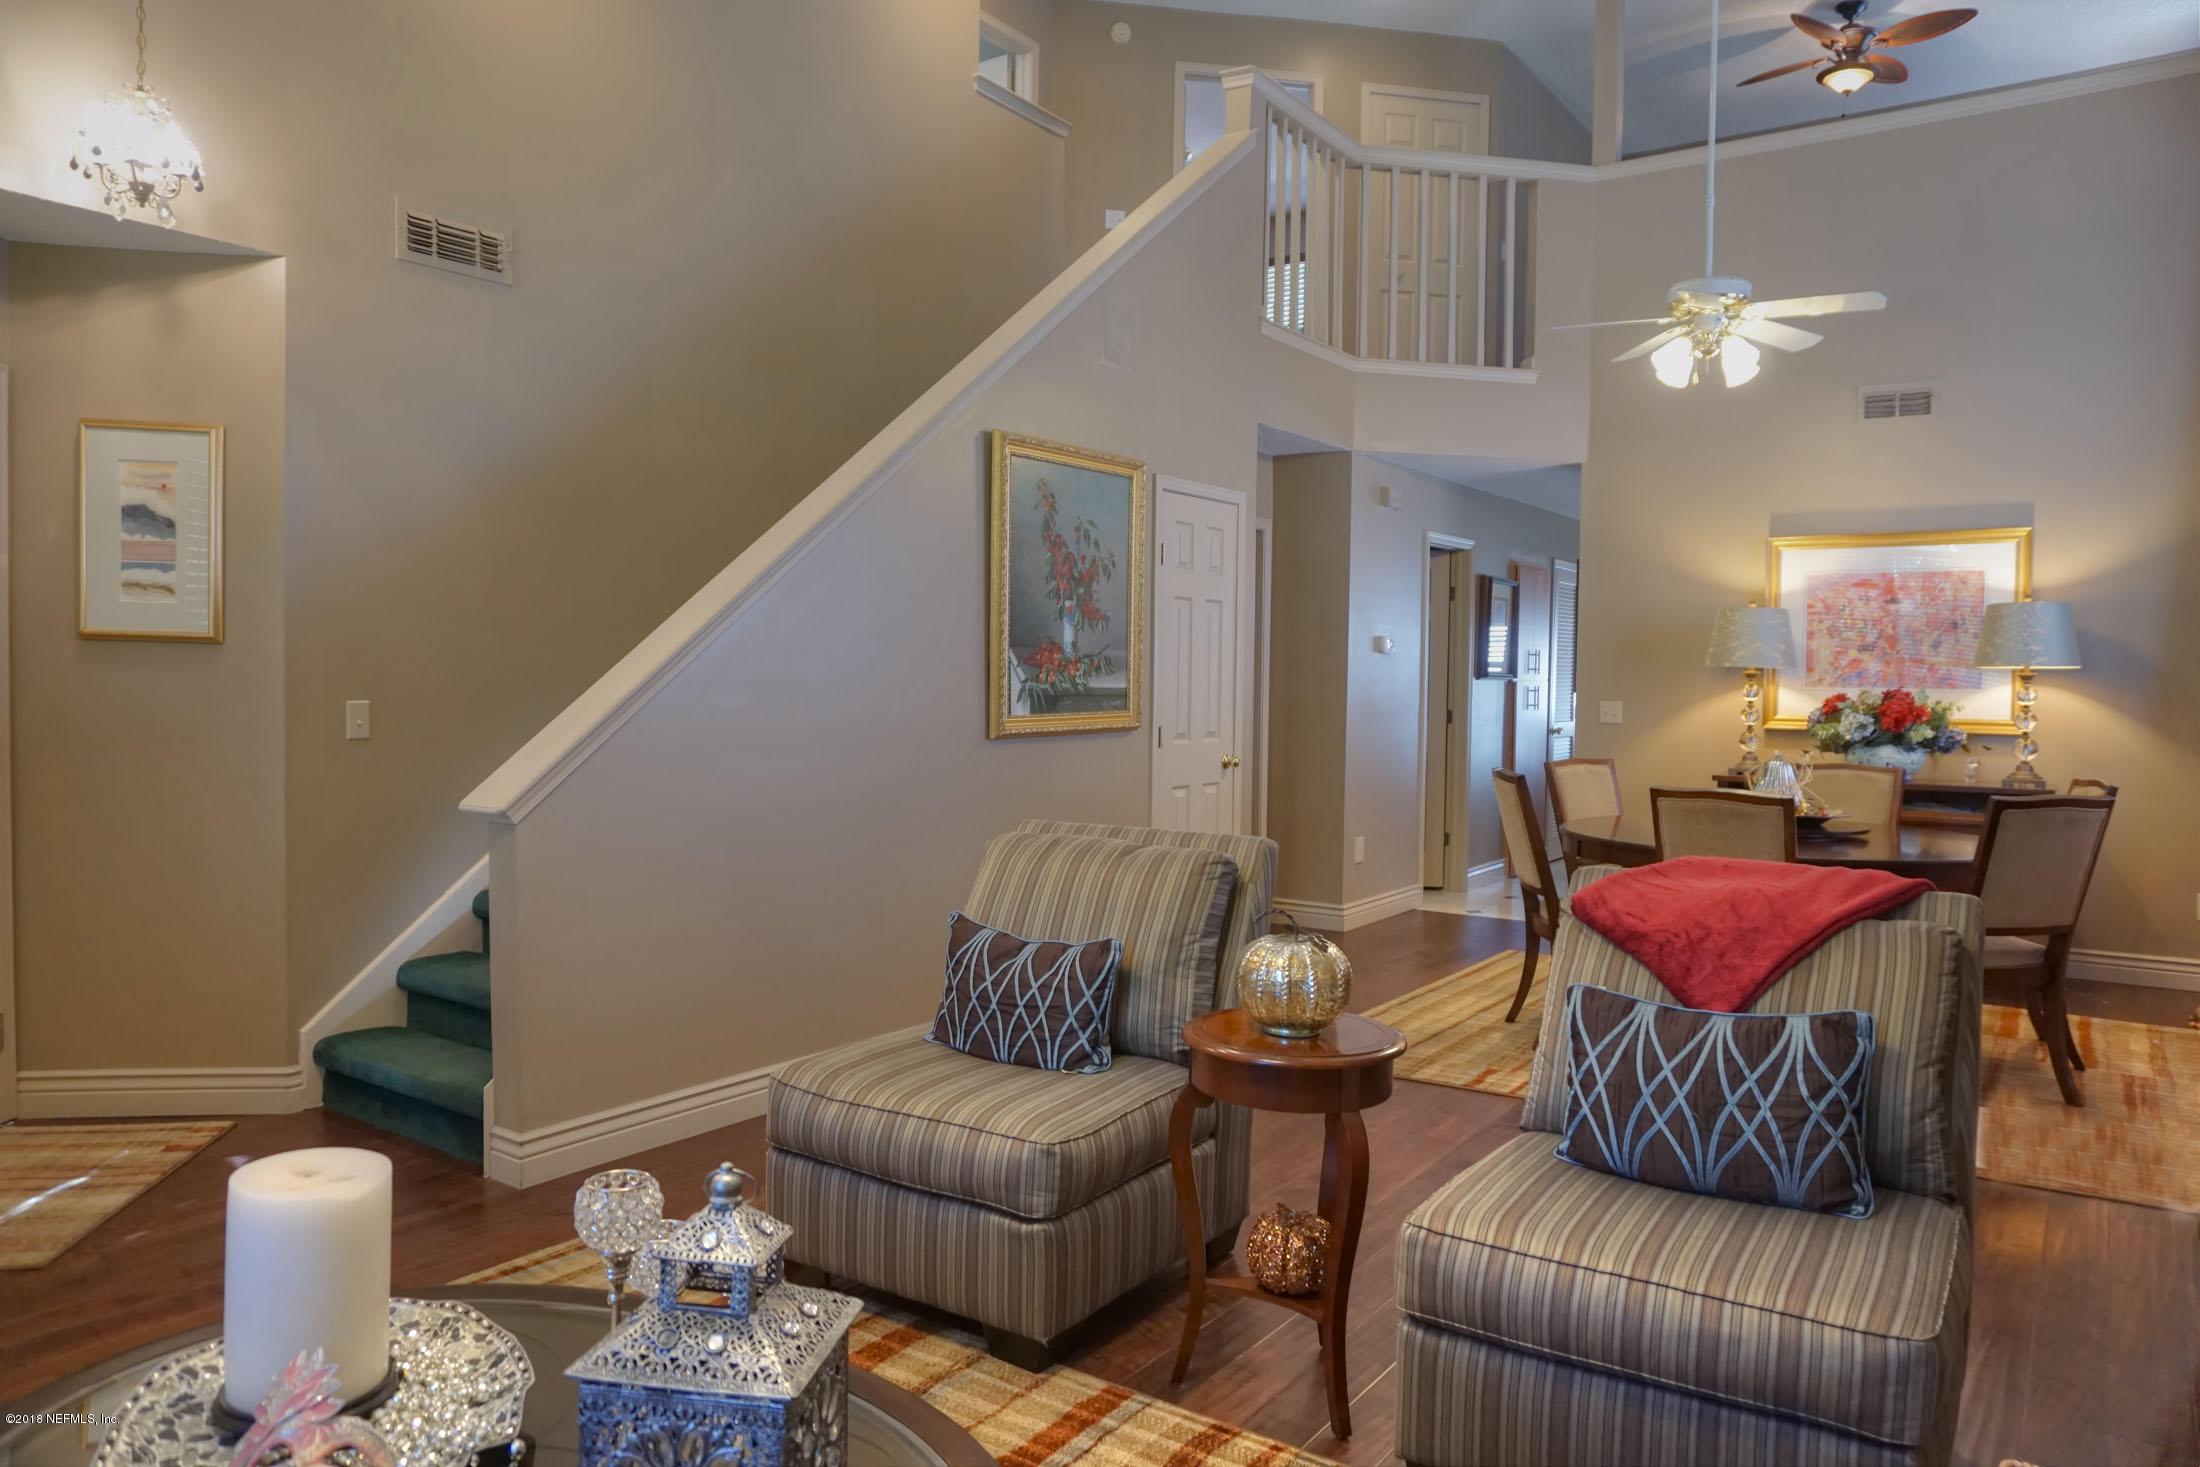 90026 EAGLE COVE, FERNANDINA BEACH, FLORIDA 32034, 4 Bedrooms Bedrooms, ,3 BathroomsBathrooms,Residential - single family,For sale,EAGLE COVE,953636